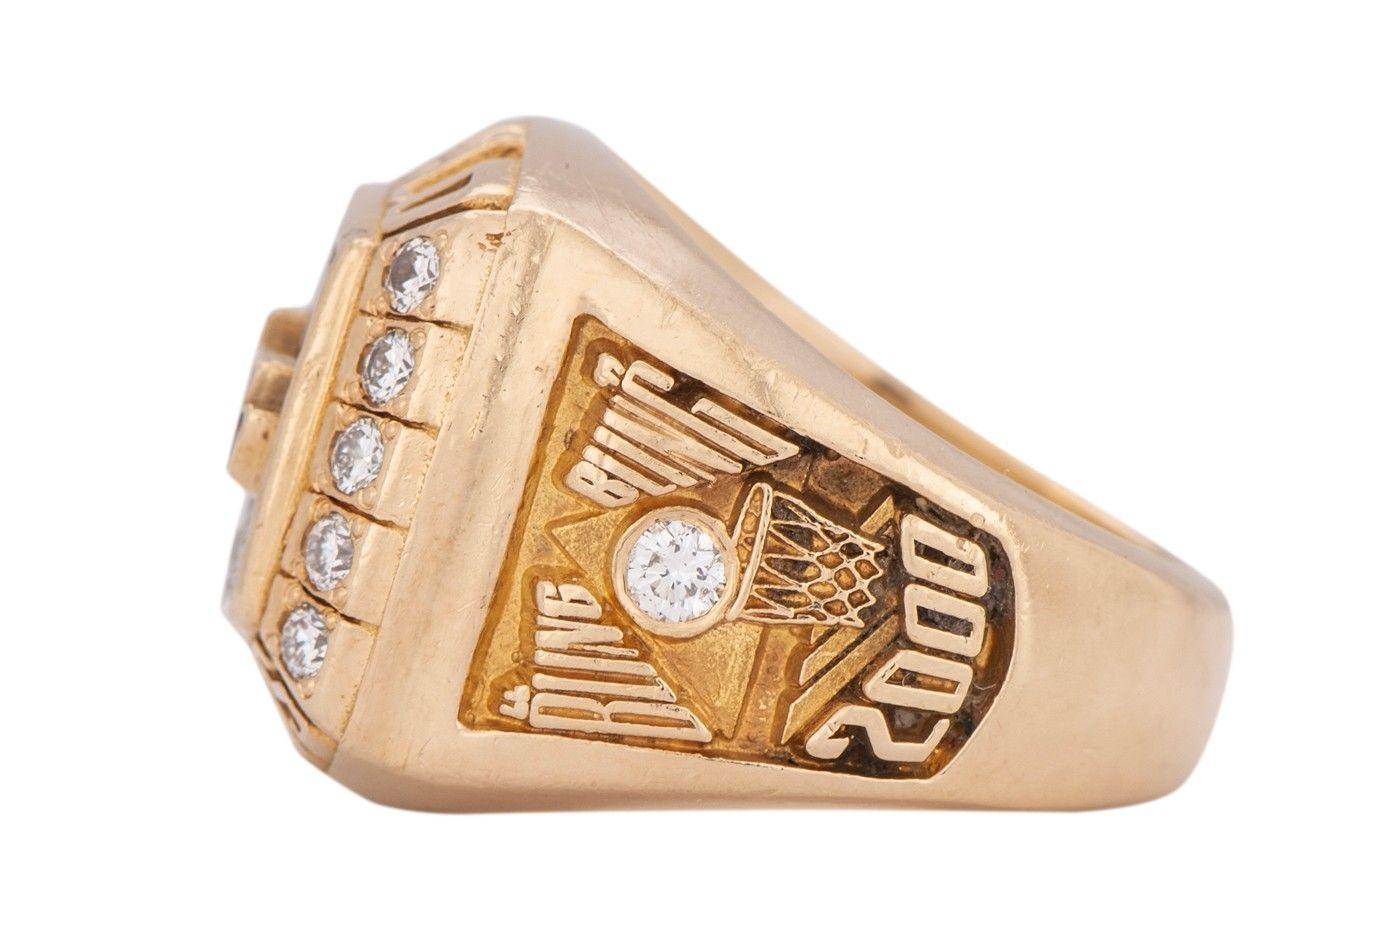 Коби Брайант кольцо чемпиона НБА продано